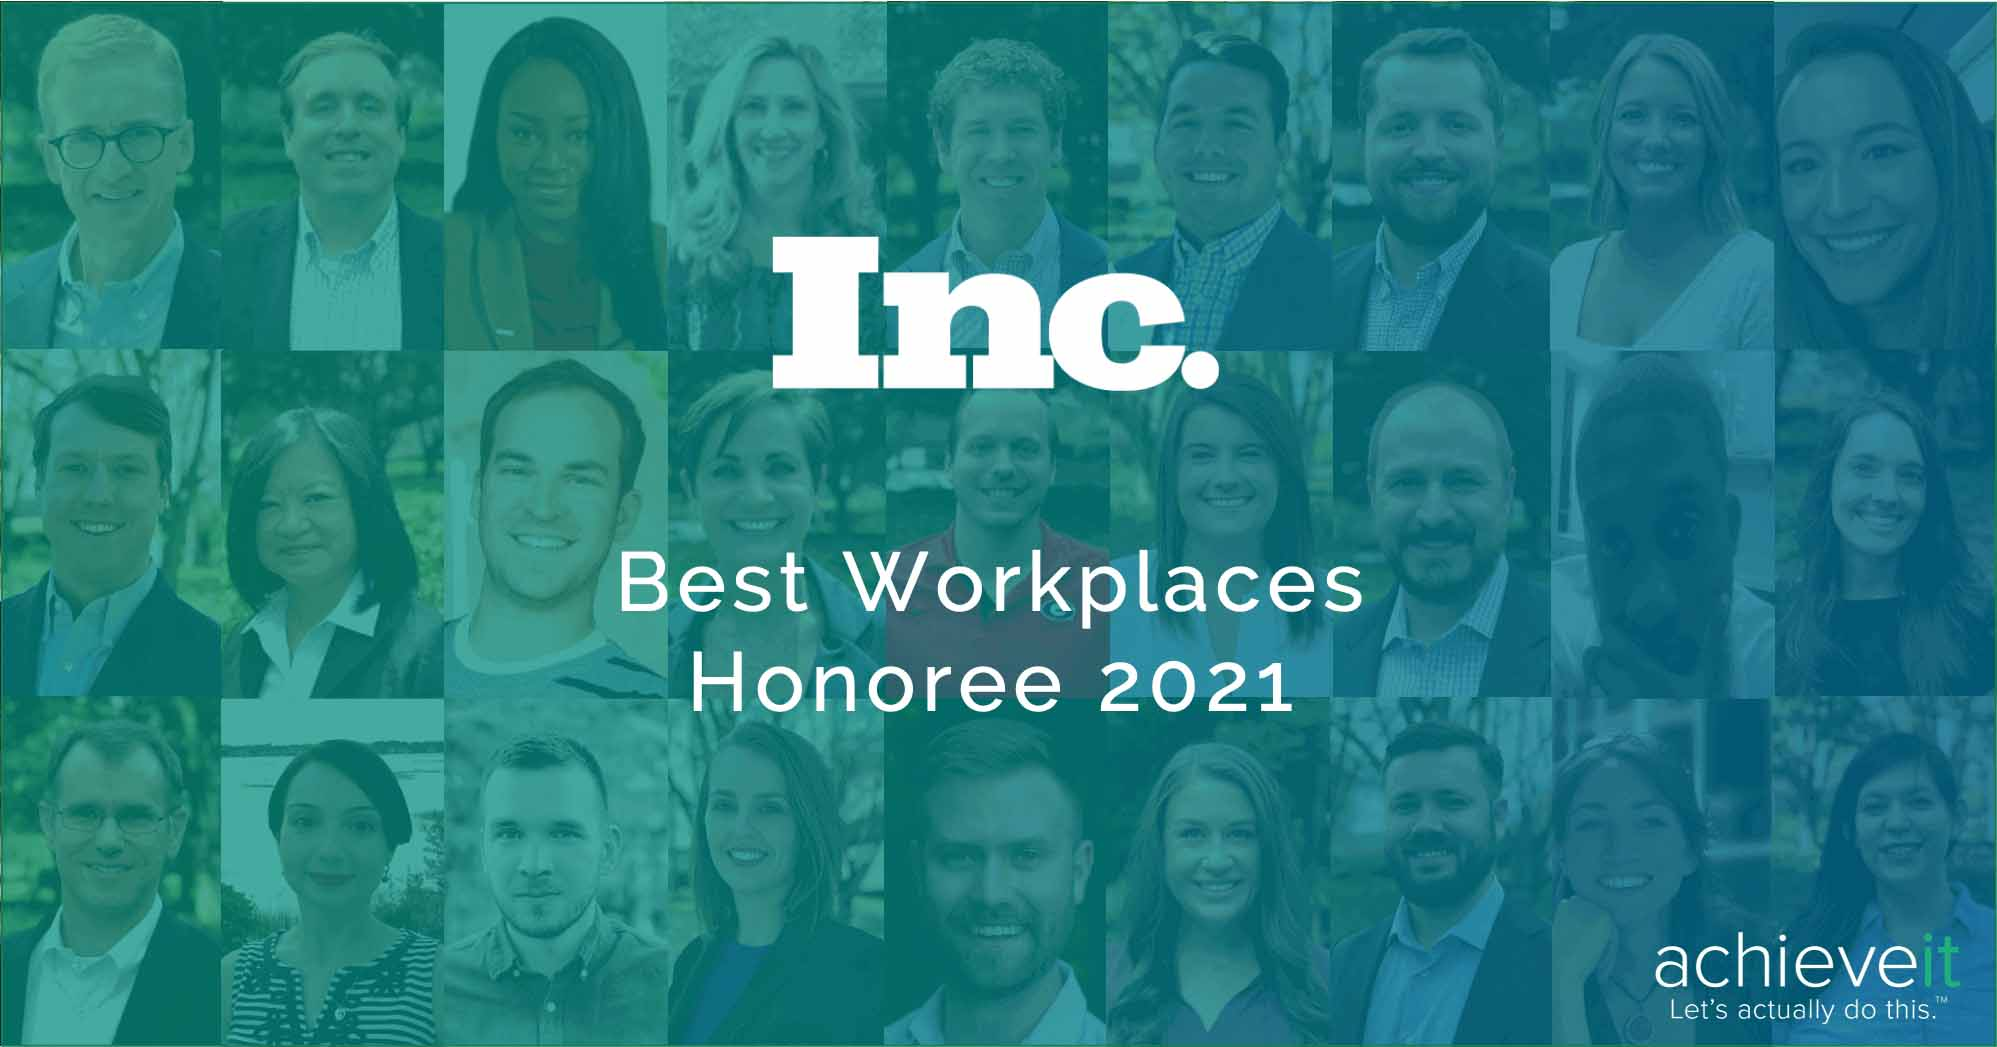 Inc Magazines Best Workplaces Honoree_achieveit